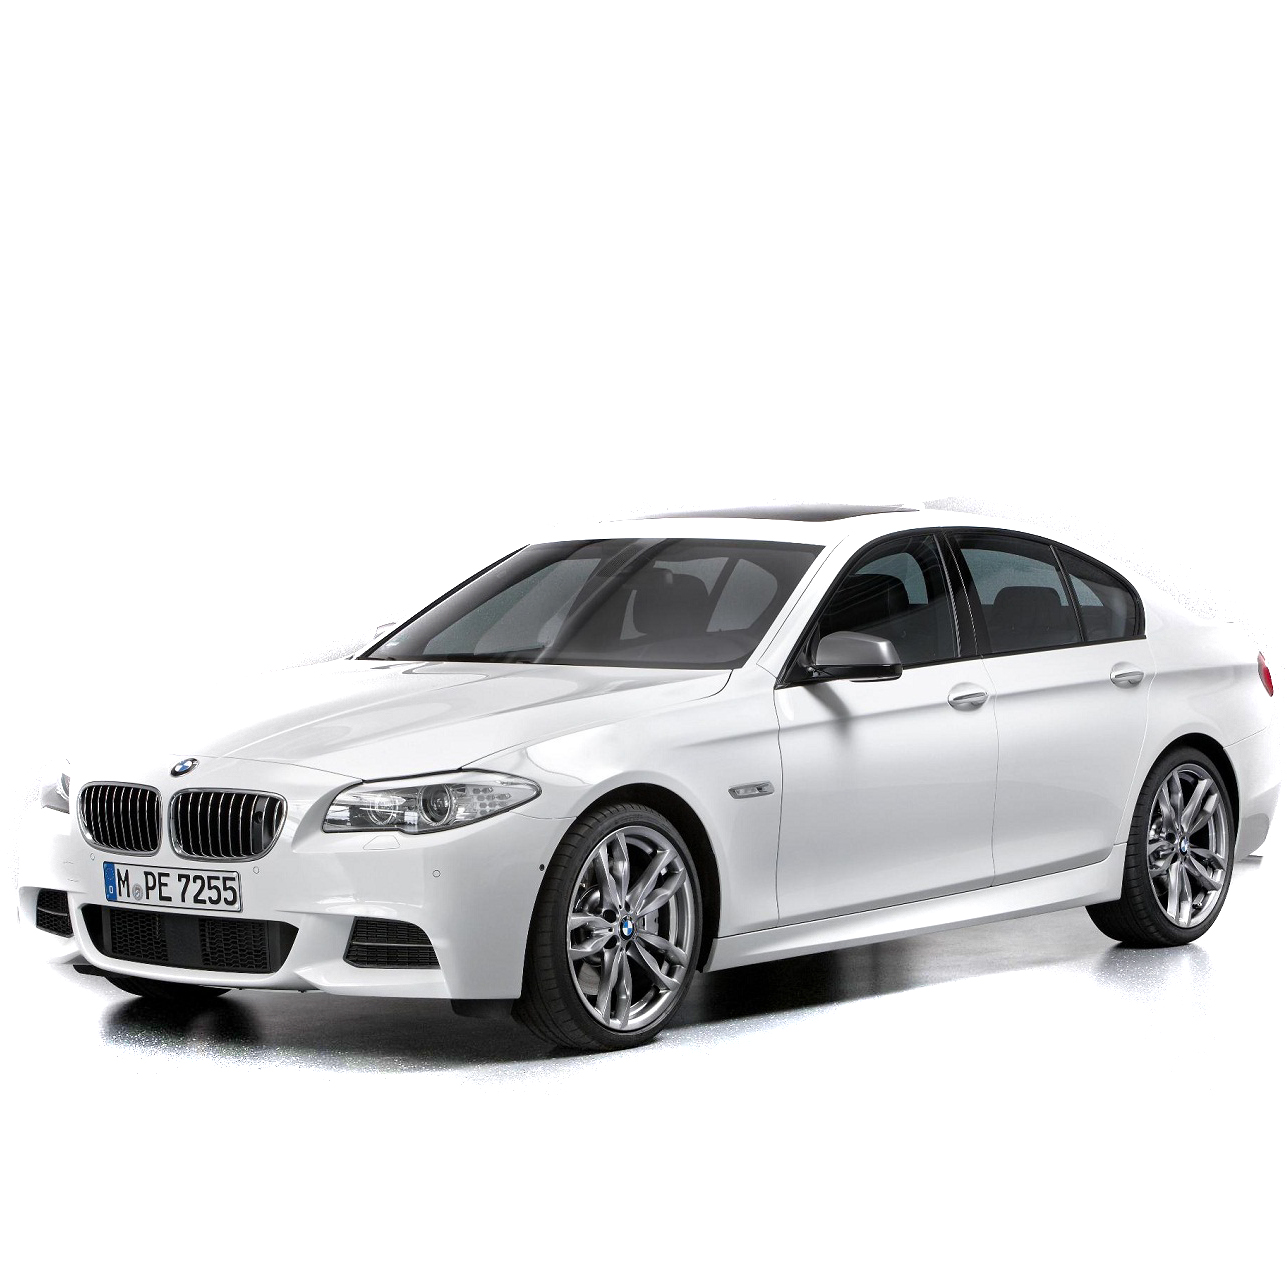 BMW 5 Series (F10) 2010-2013